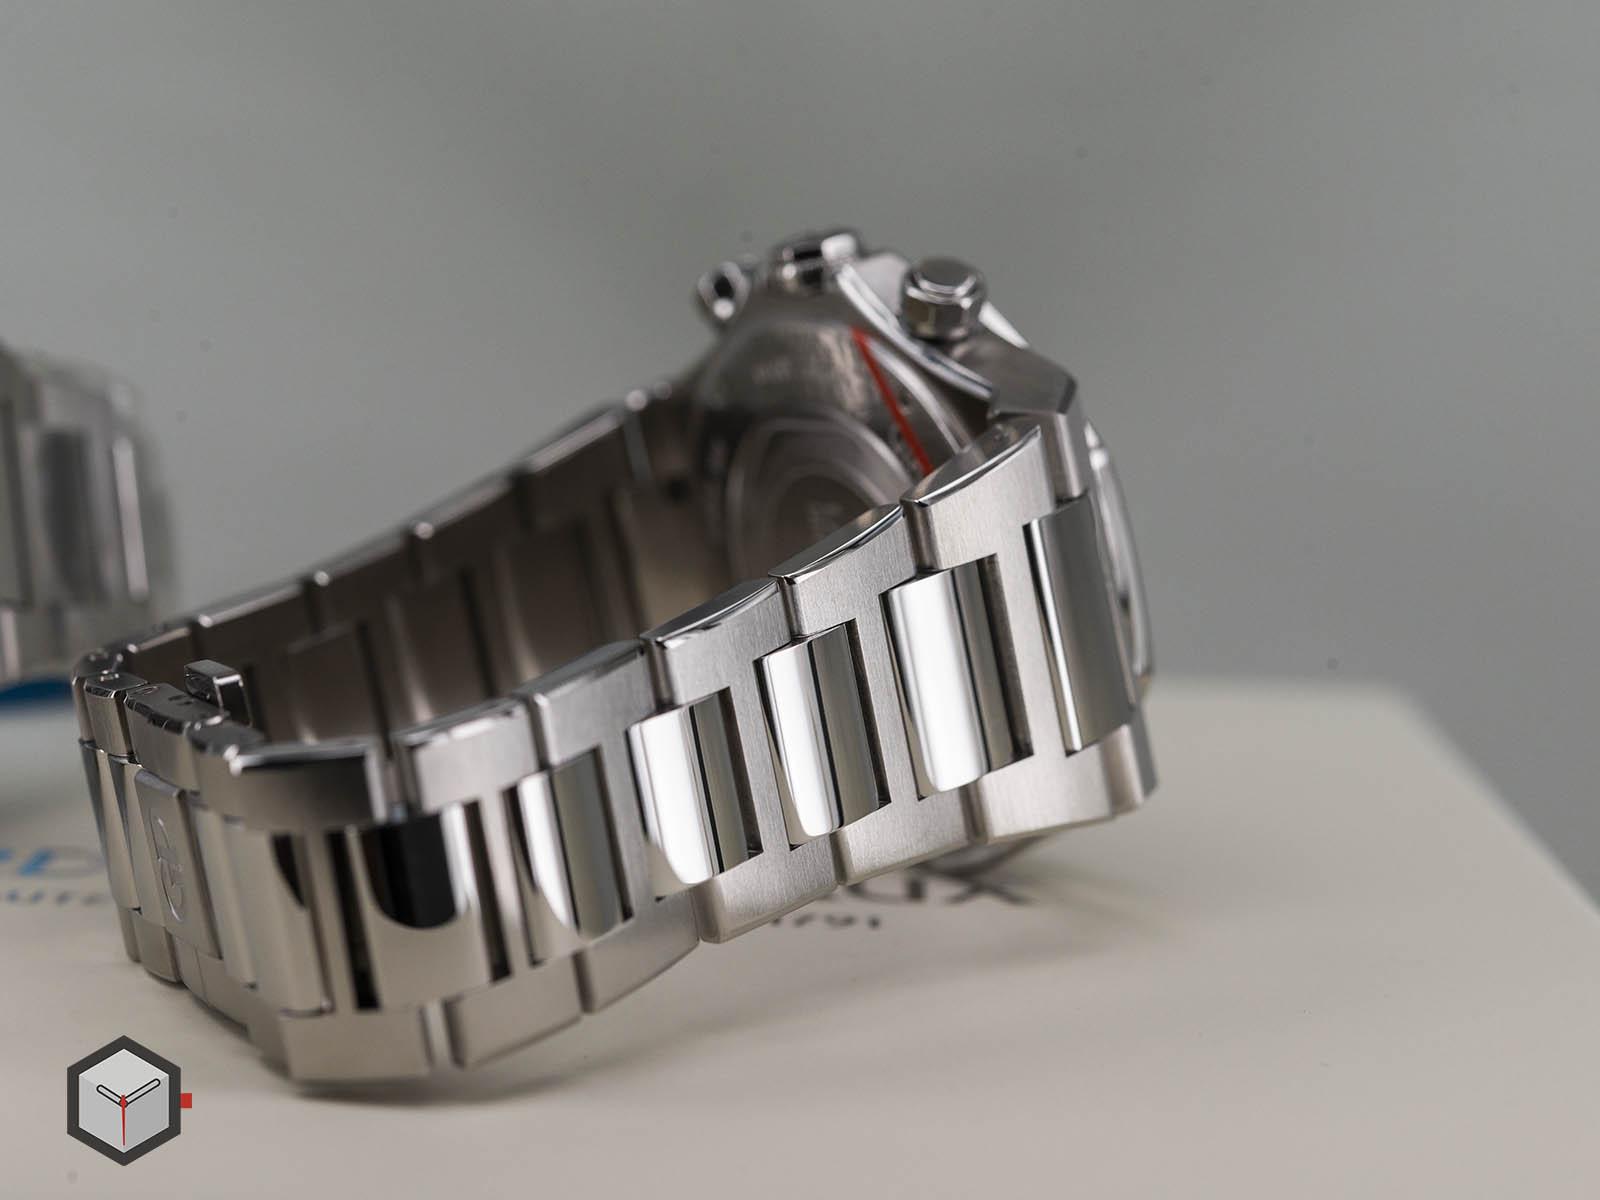 girard-perregaux-laureato-chronograph-42-mm-11.jpg